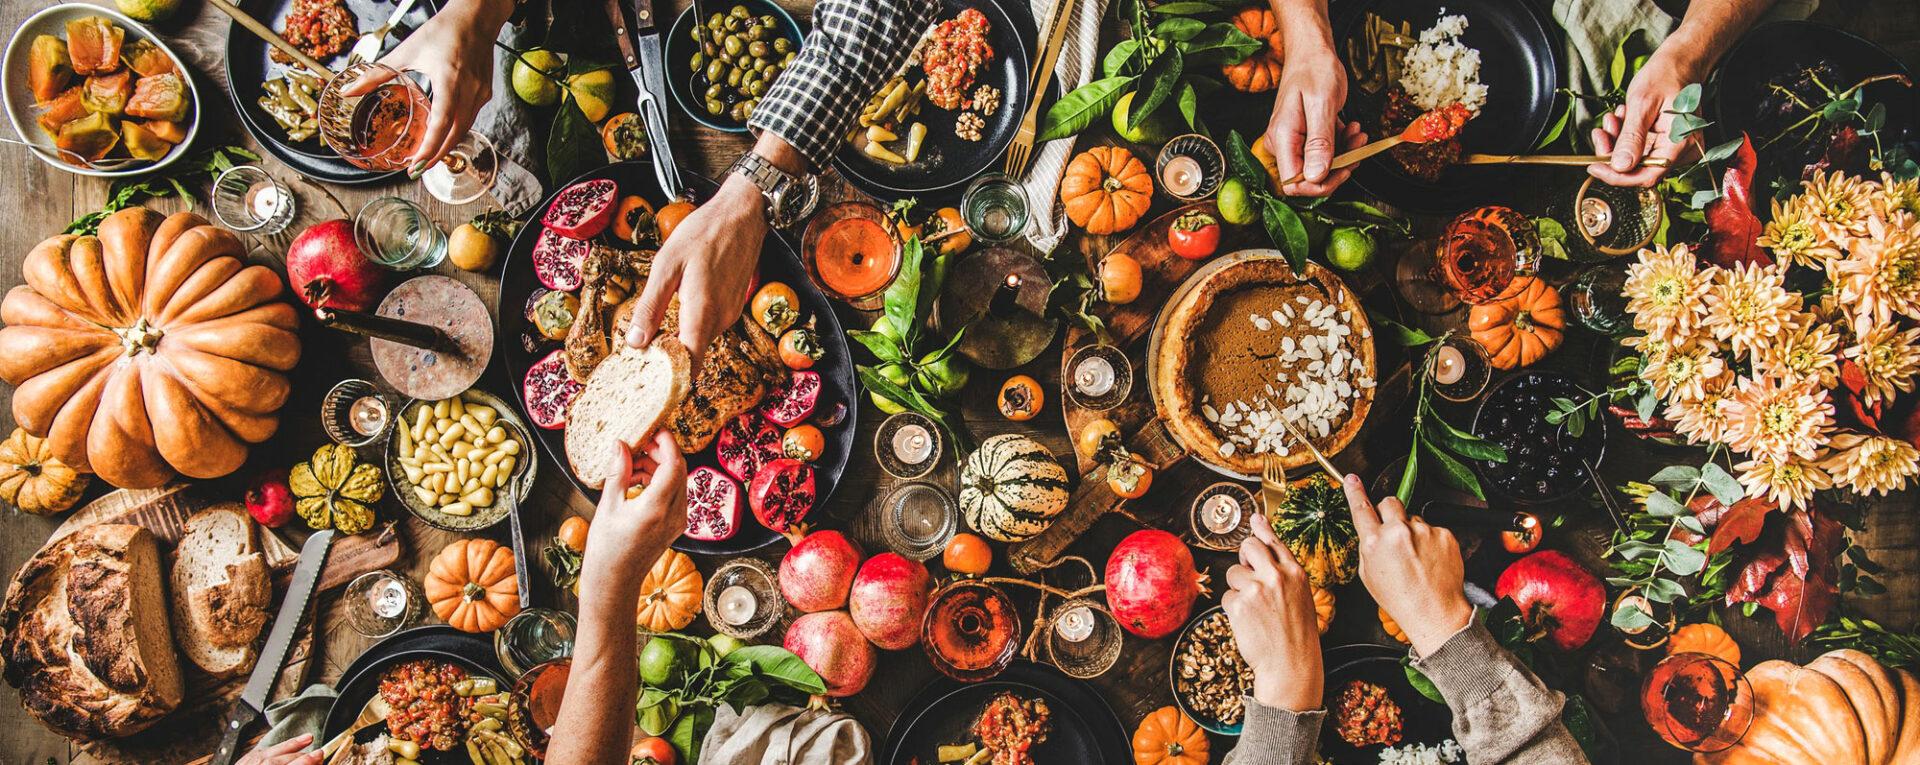 Fall restaurant seasonal planning tips - A big return to inside dining